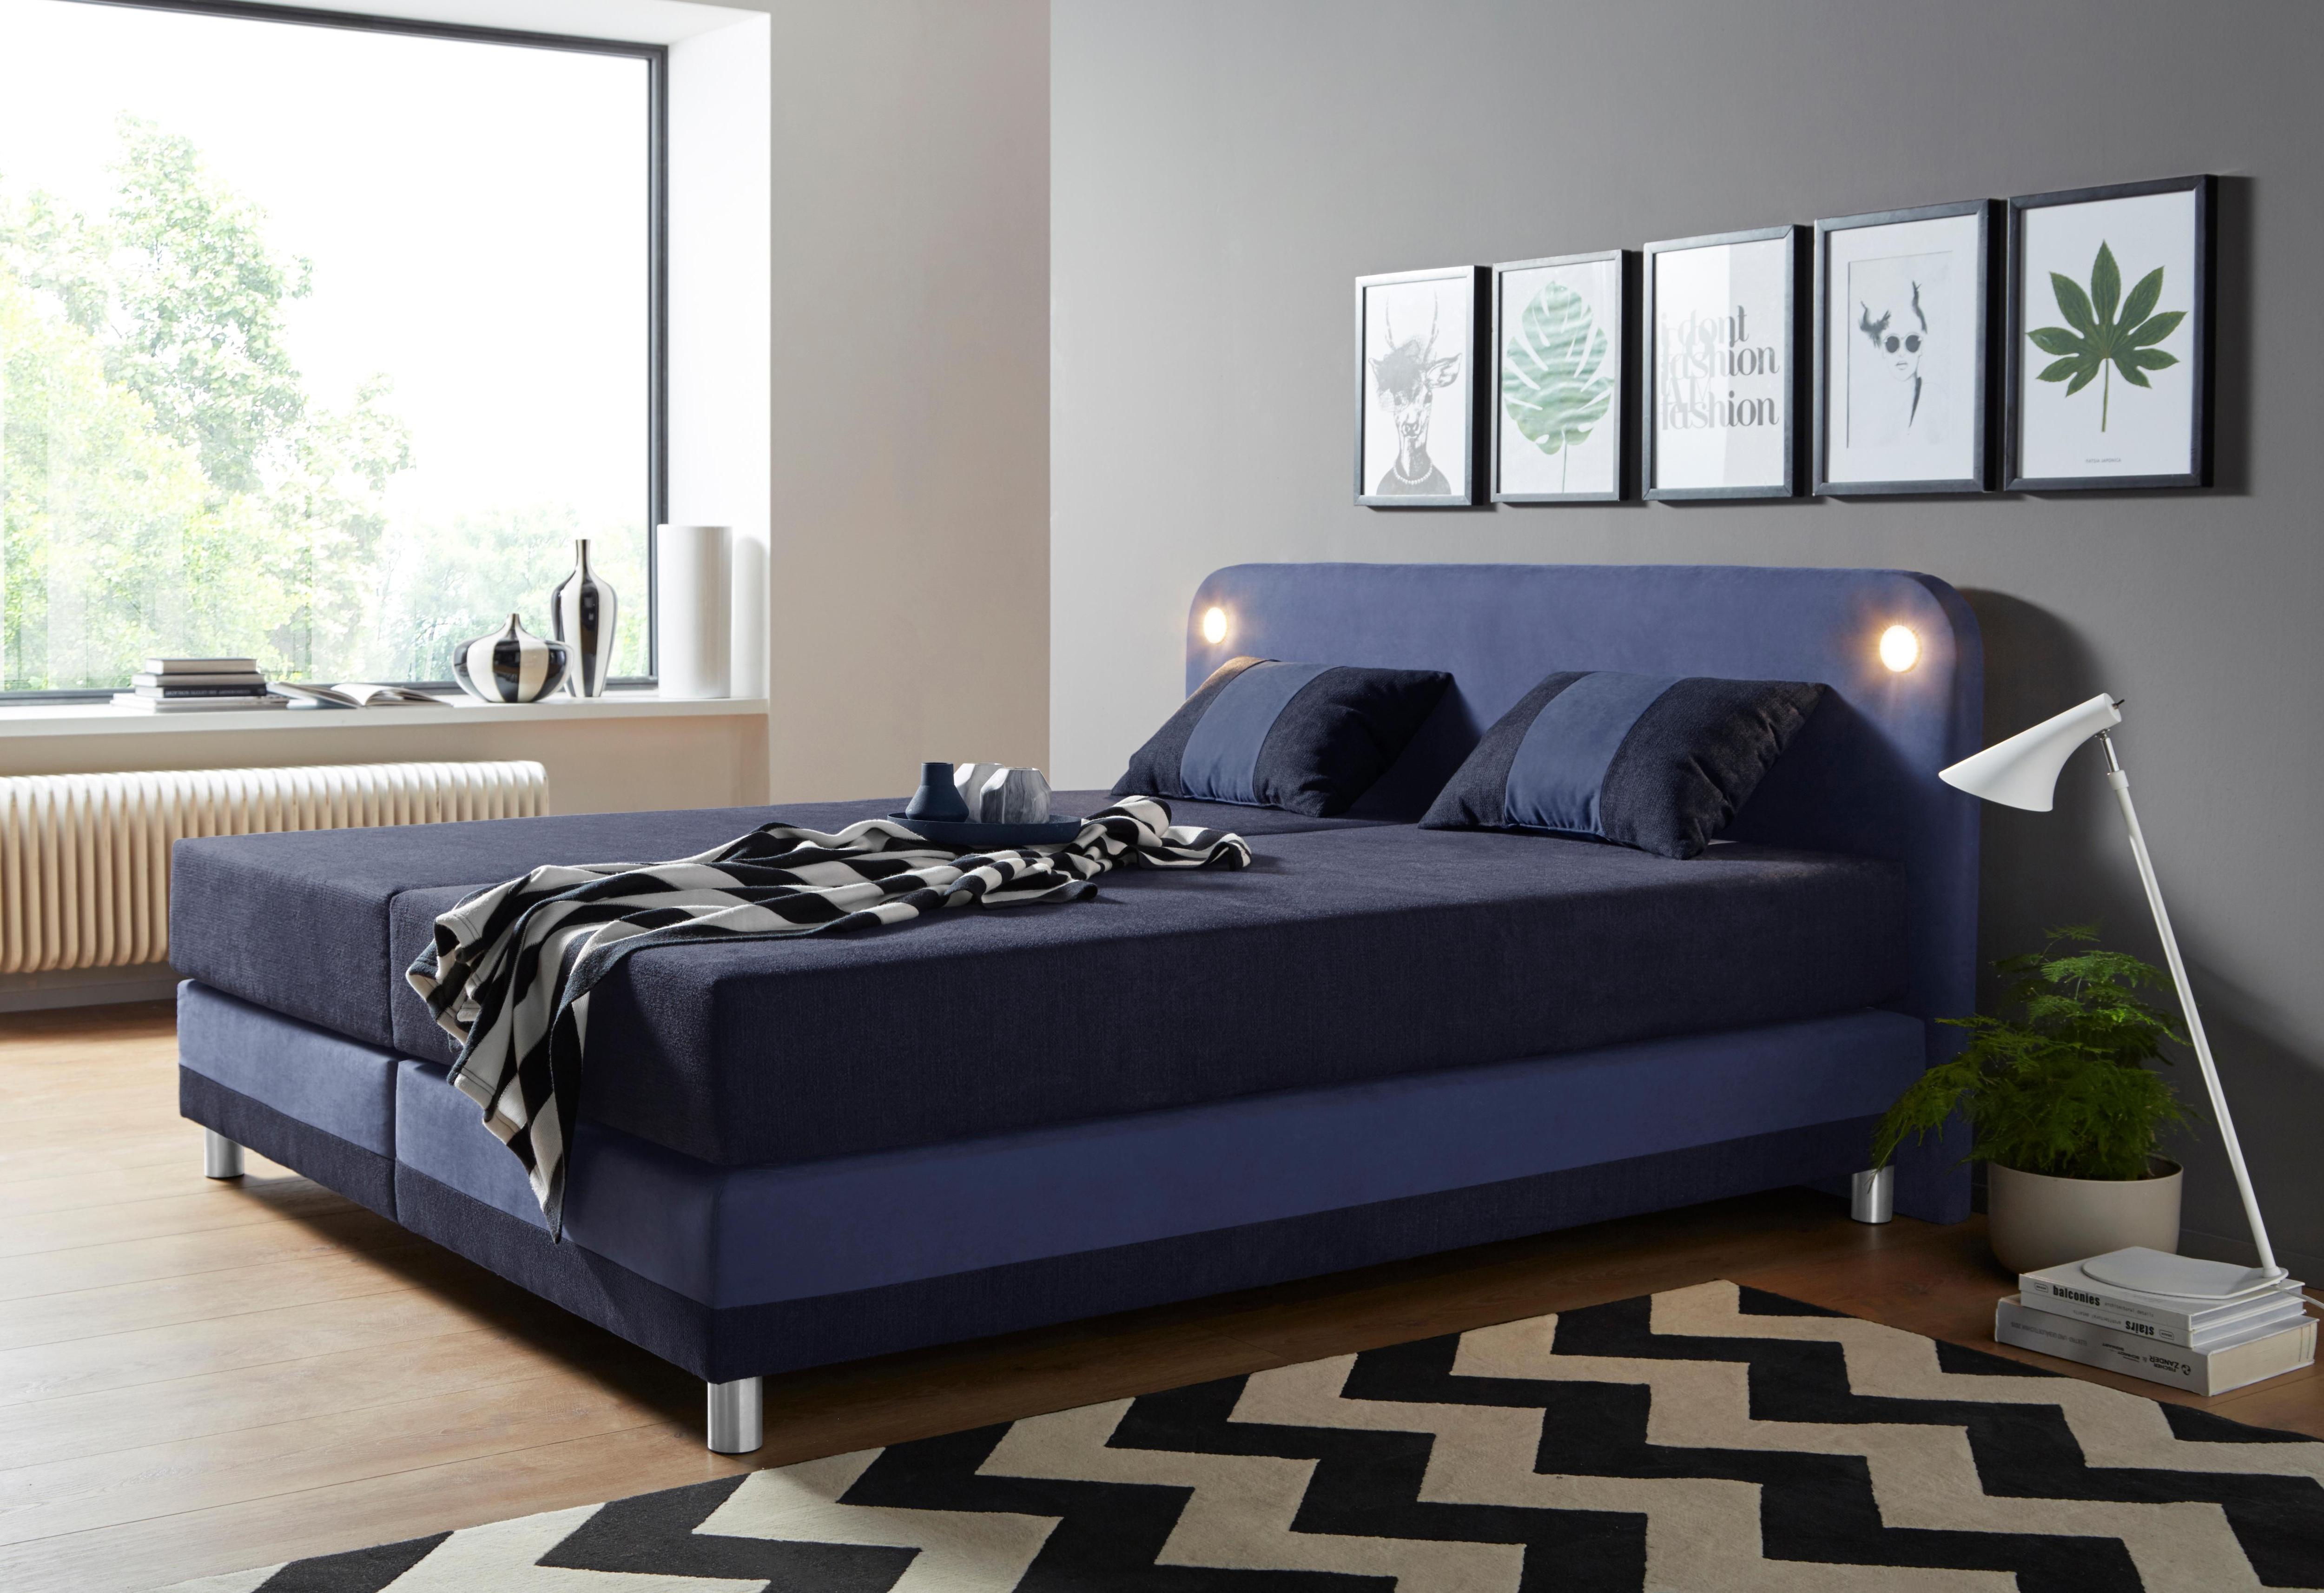 Maintal Boxspringbett inklusive LED-Beleuchtung und Kissen